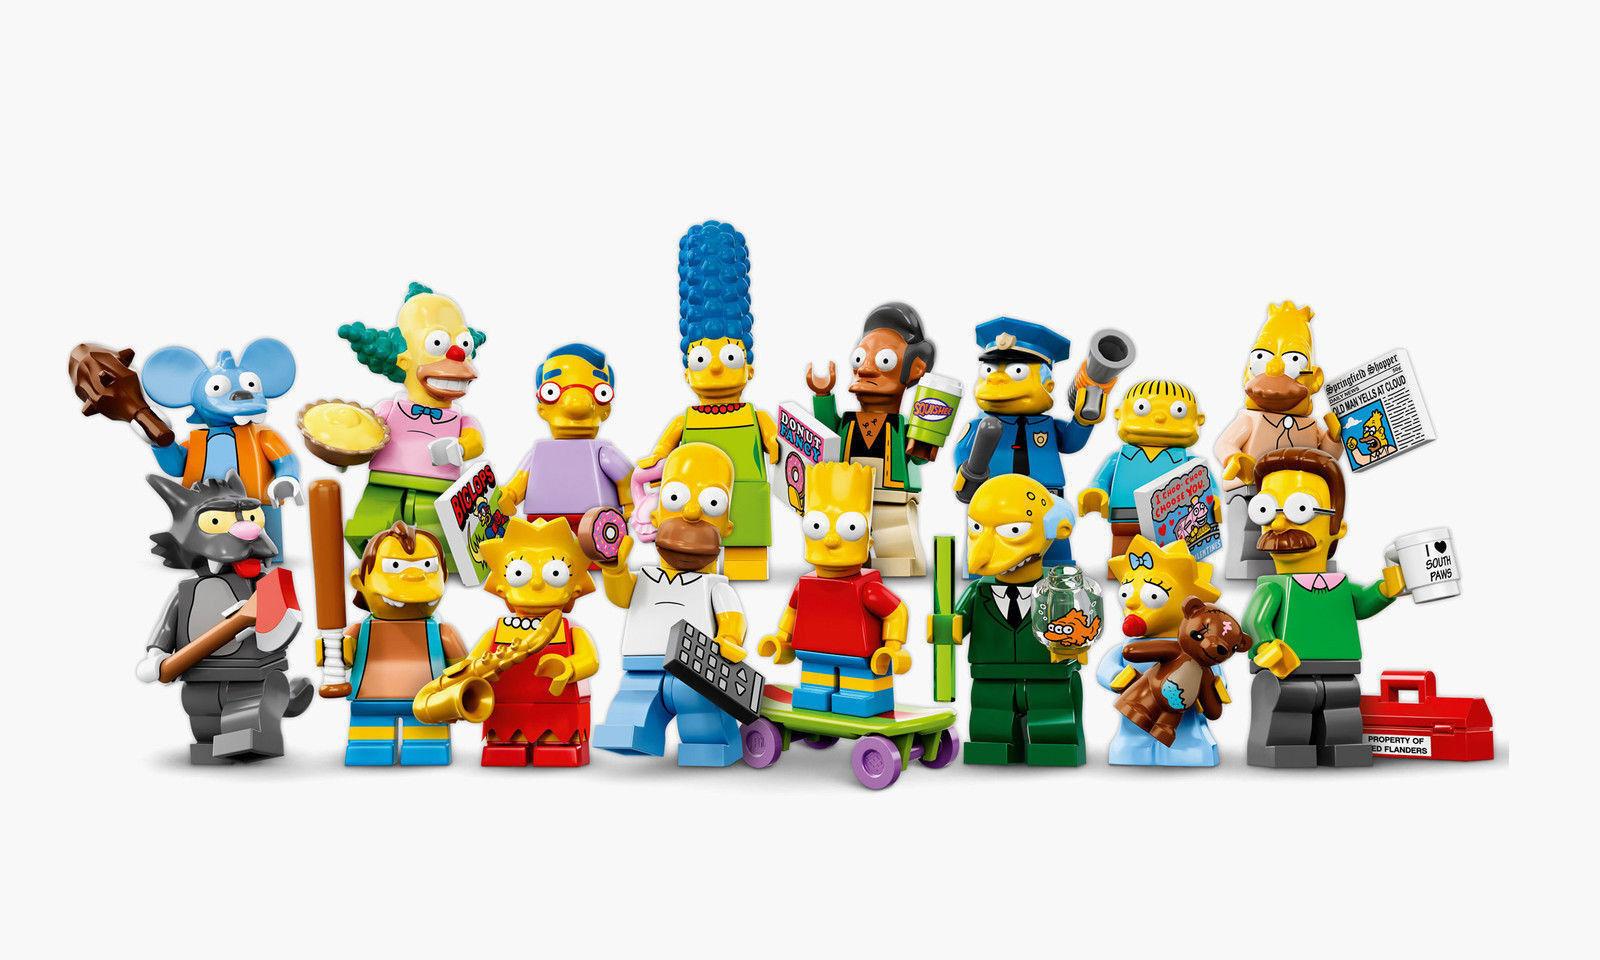 Lego Figurines Série Simpsons, Complet - Complet Series 16pcs Mini Figurines